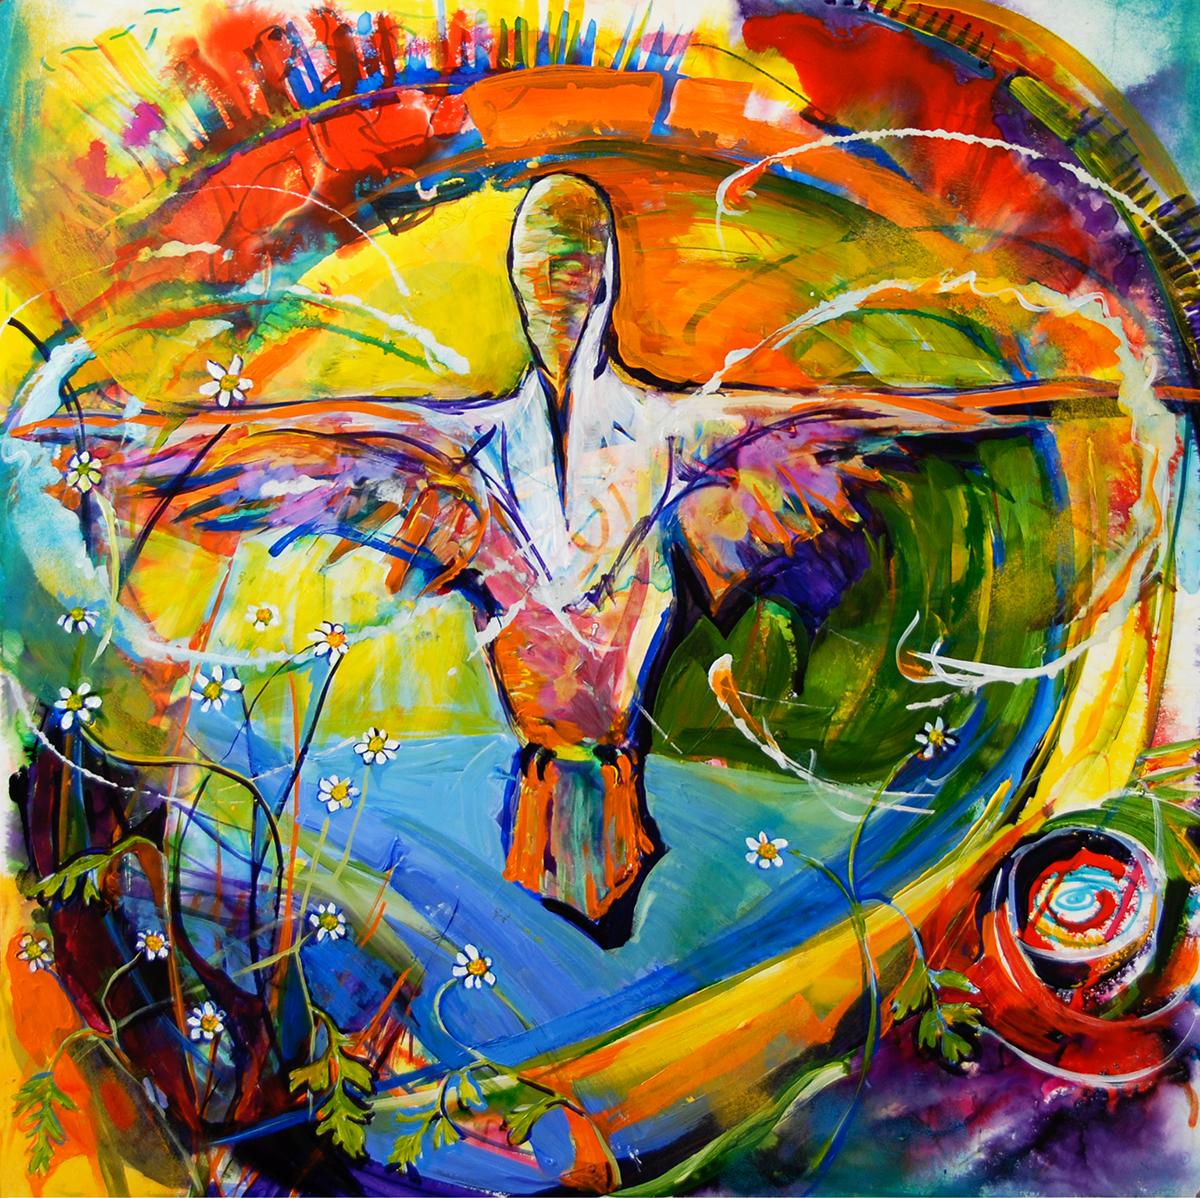 Hummingbirdmother og pqbcfz